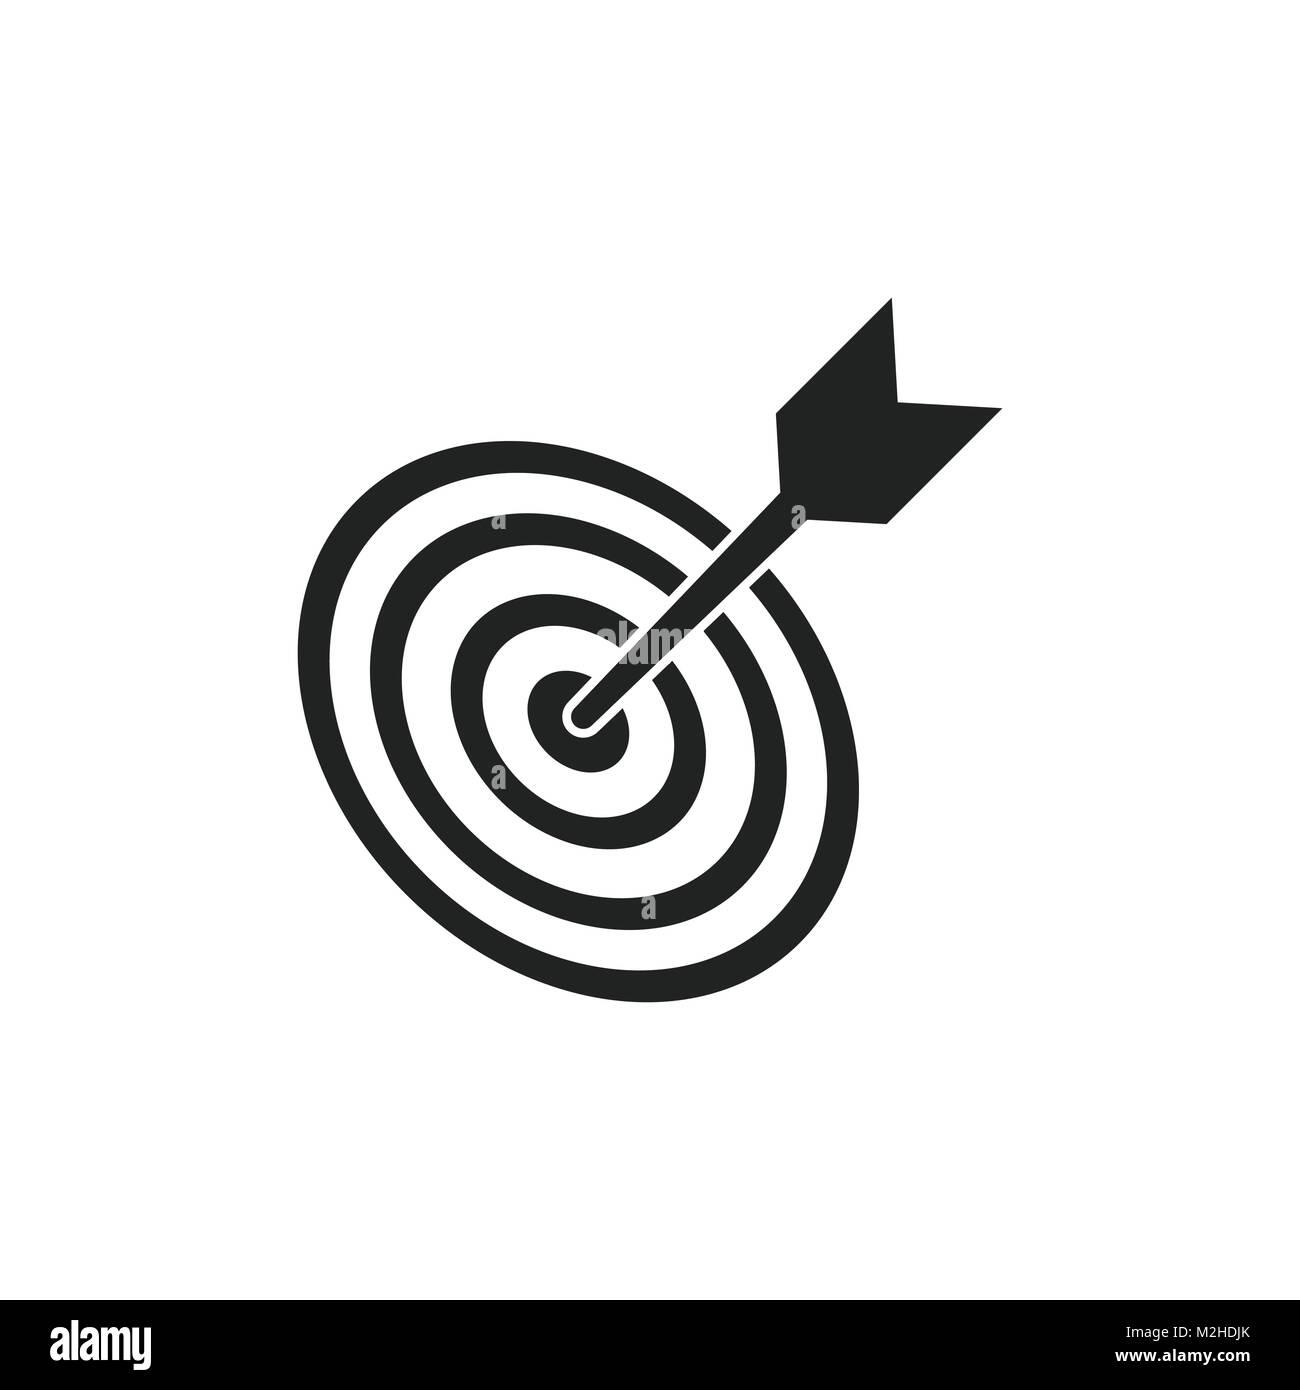 Target aim flat vector icon darts game symbol logo illustration target aim flat vector icon darts game symbol logo illustration success pictogram concept buycottarizona Image collections